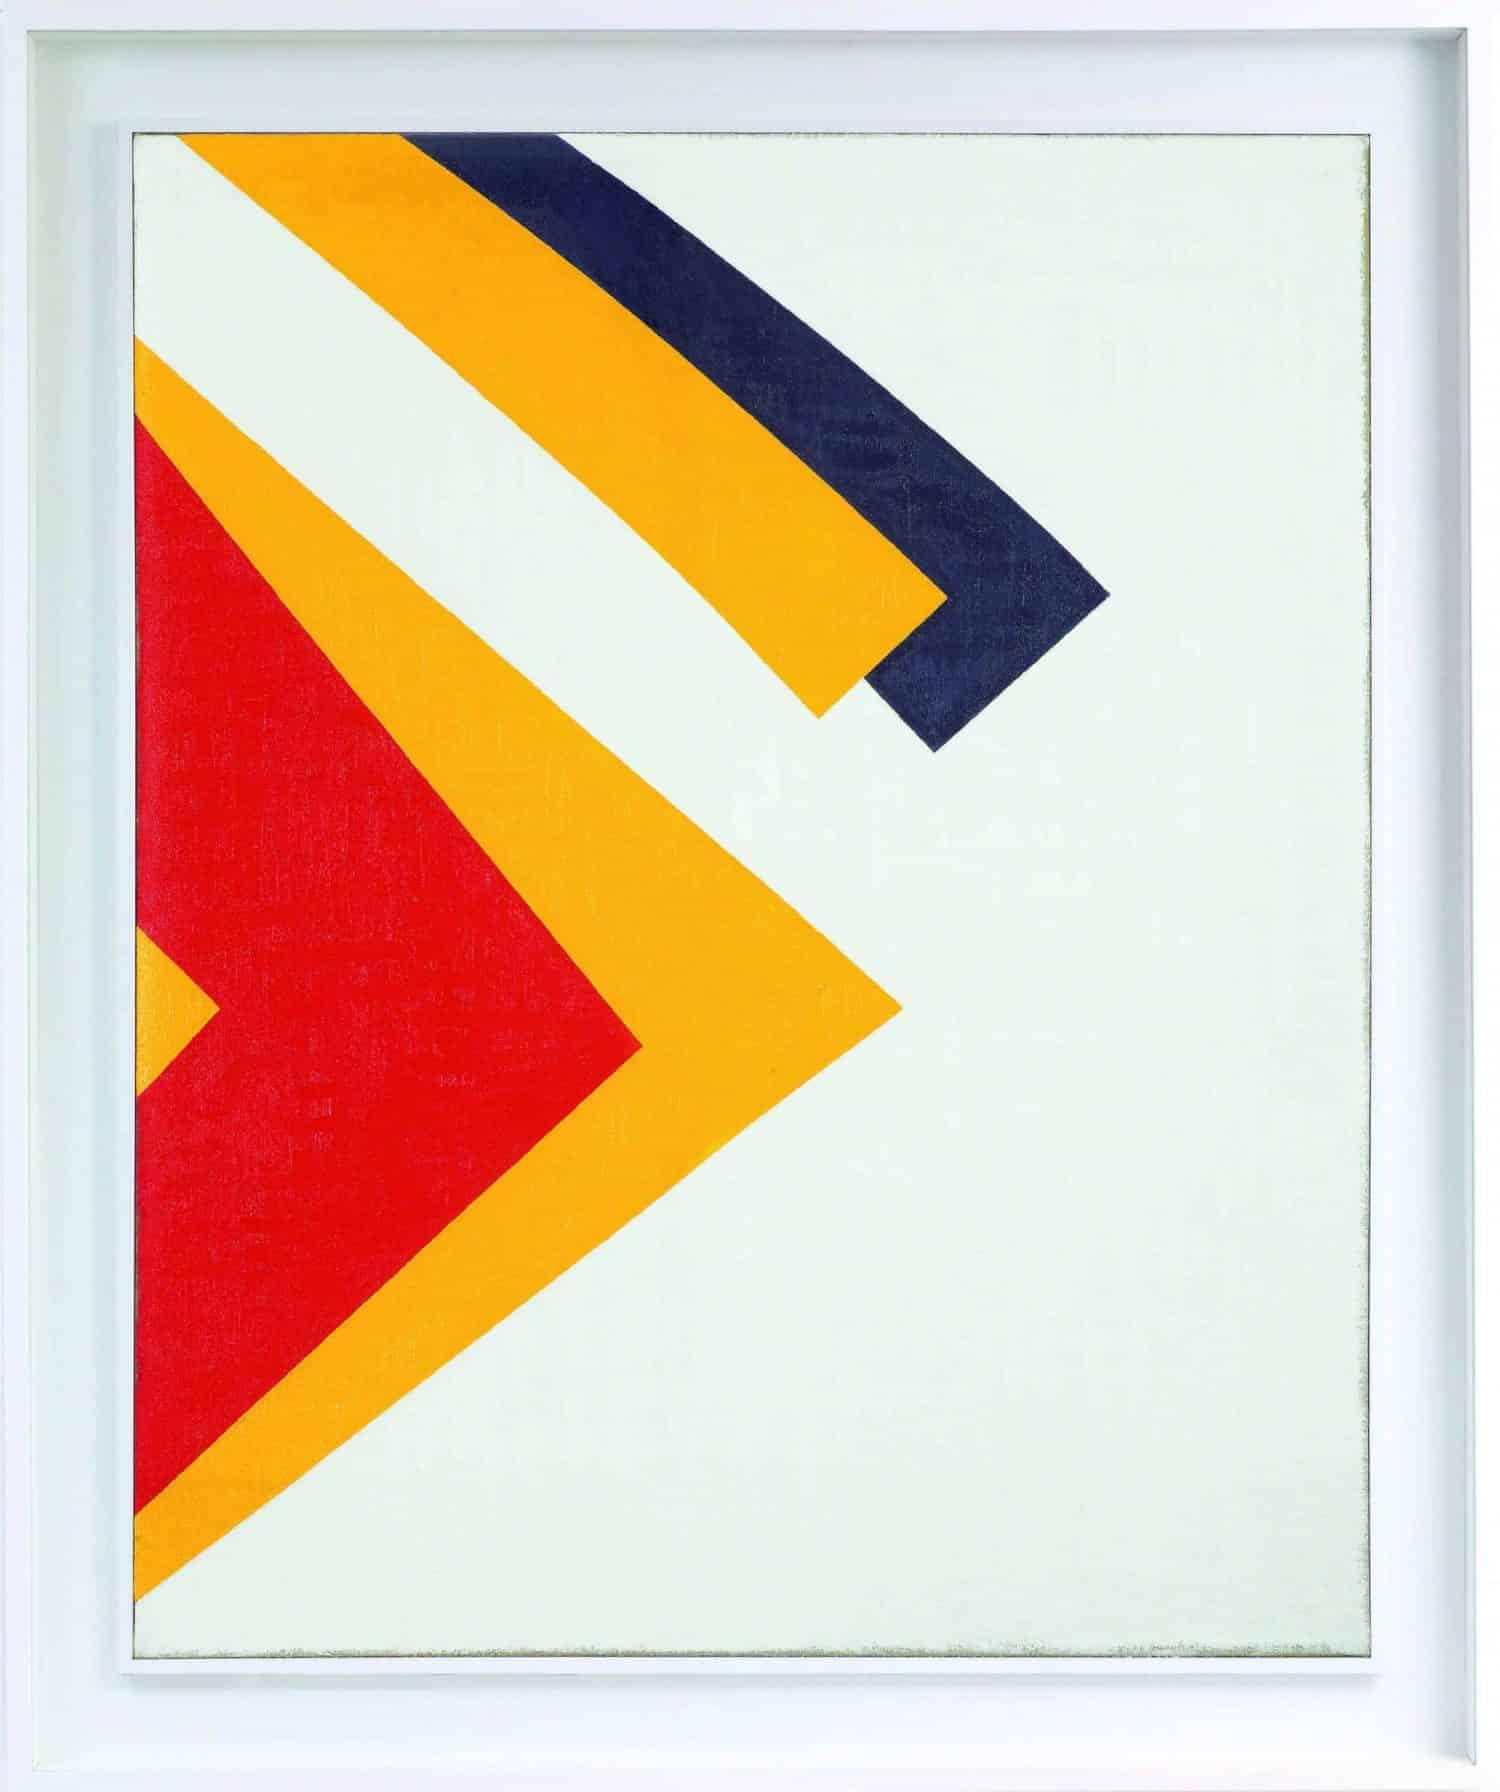 Keith Coventry - Reflex Gallery Amsterdam